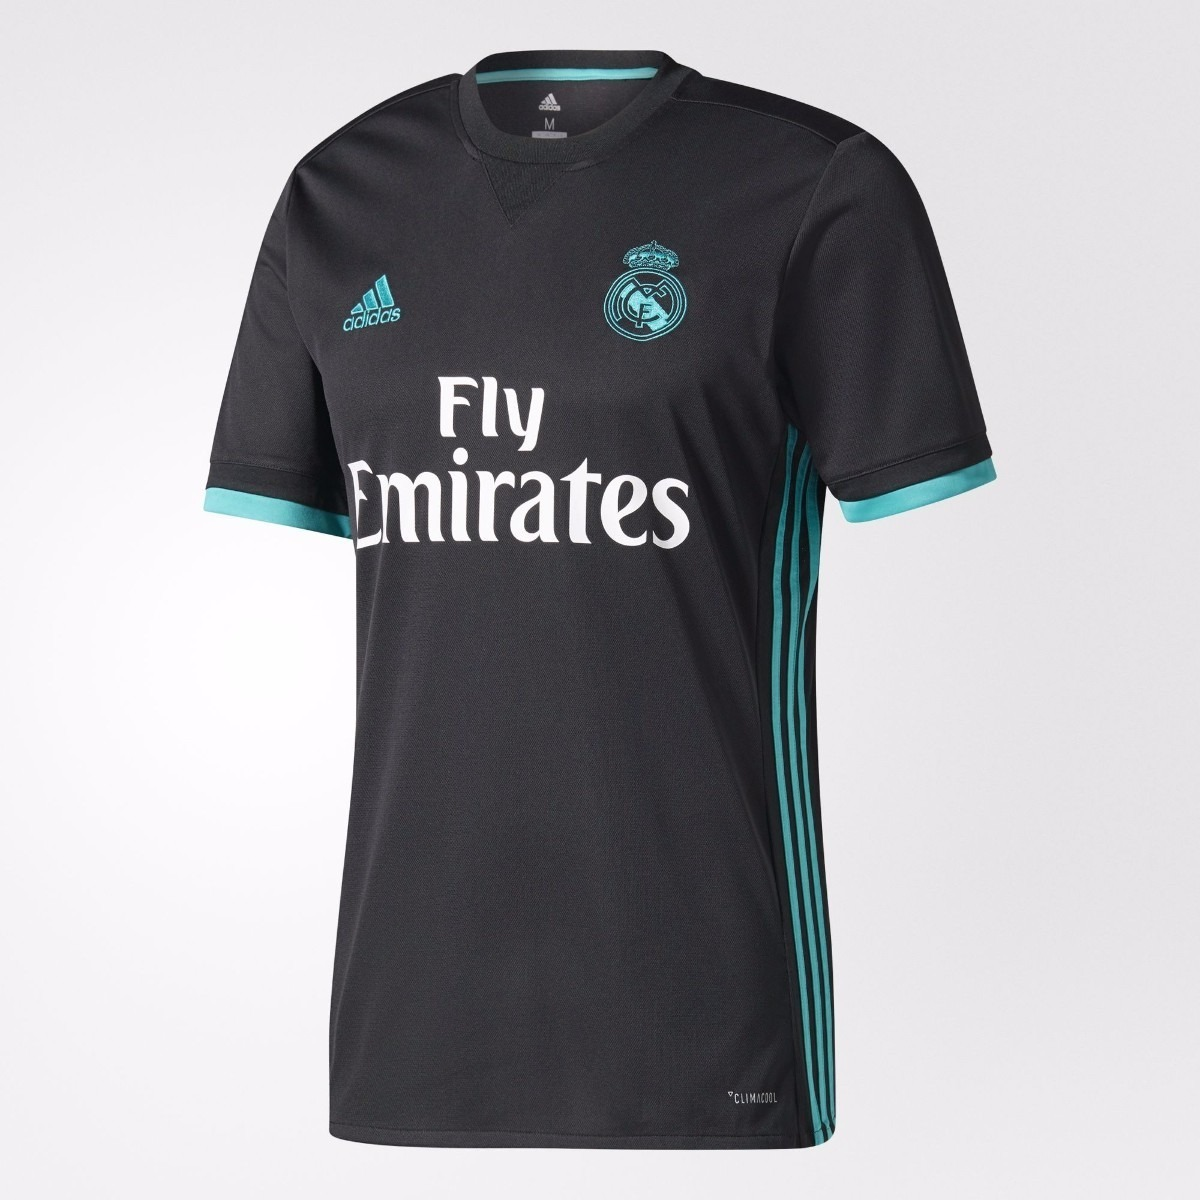 040d82f918f92 camisa real madrid cristiano ronaldo - cr7 nova preta 2018. Carregando zoom...  camisa real madrid. Carregando zoom.